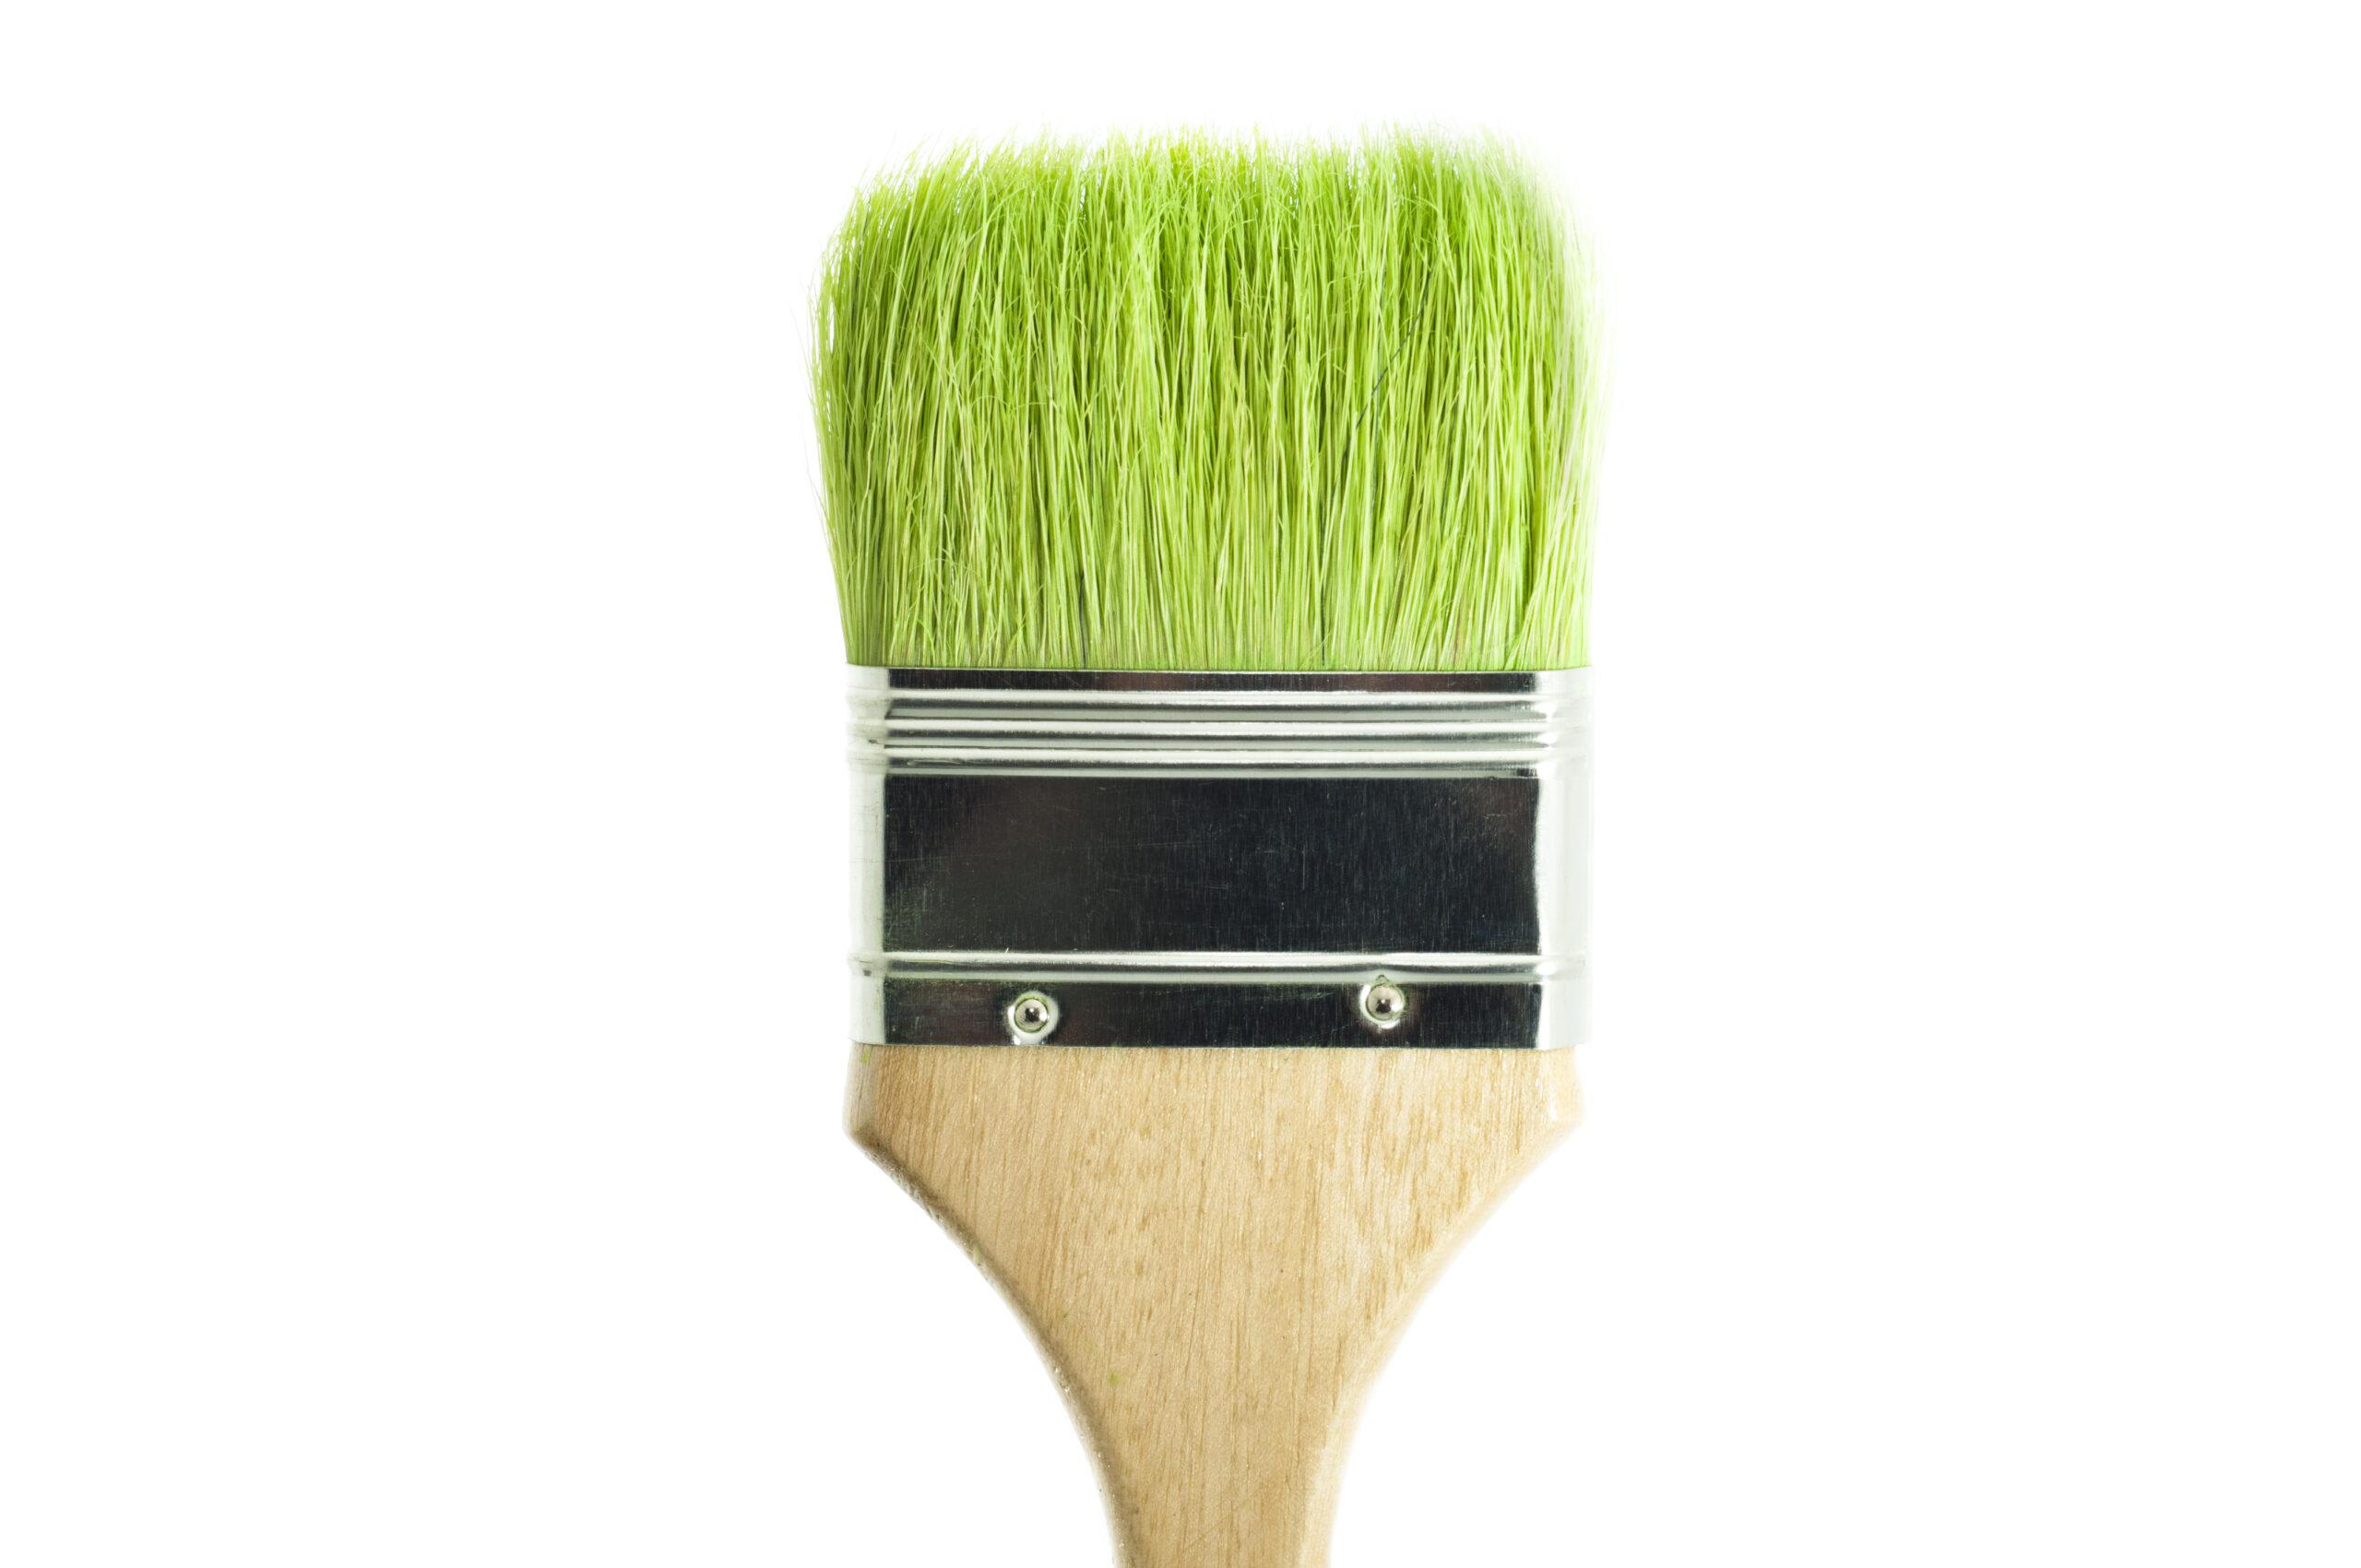 UK government sets up group to tackle greenwashing